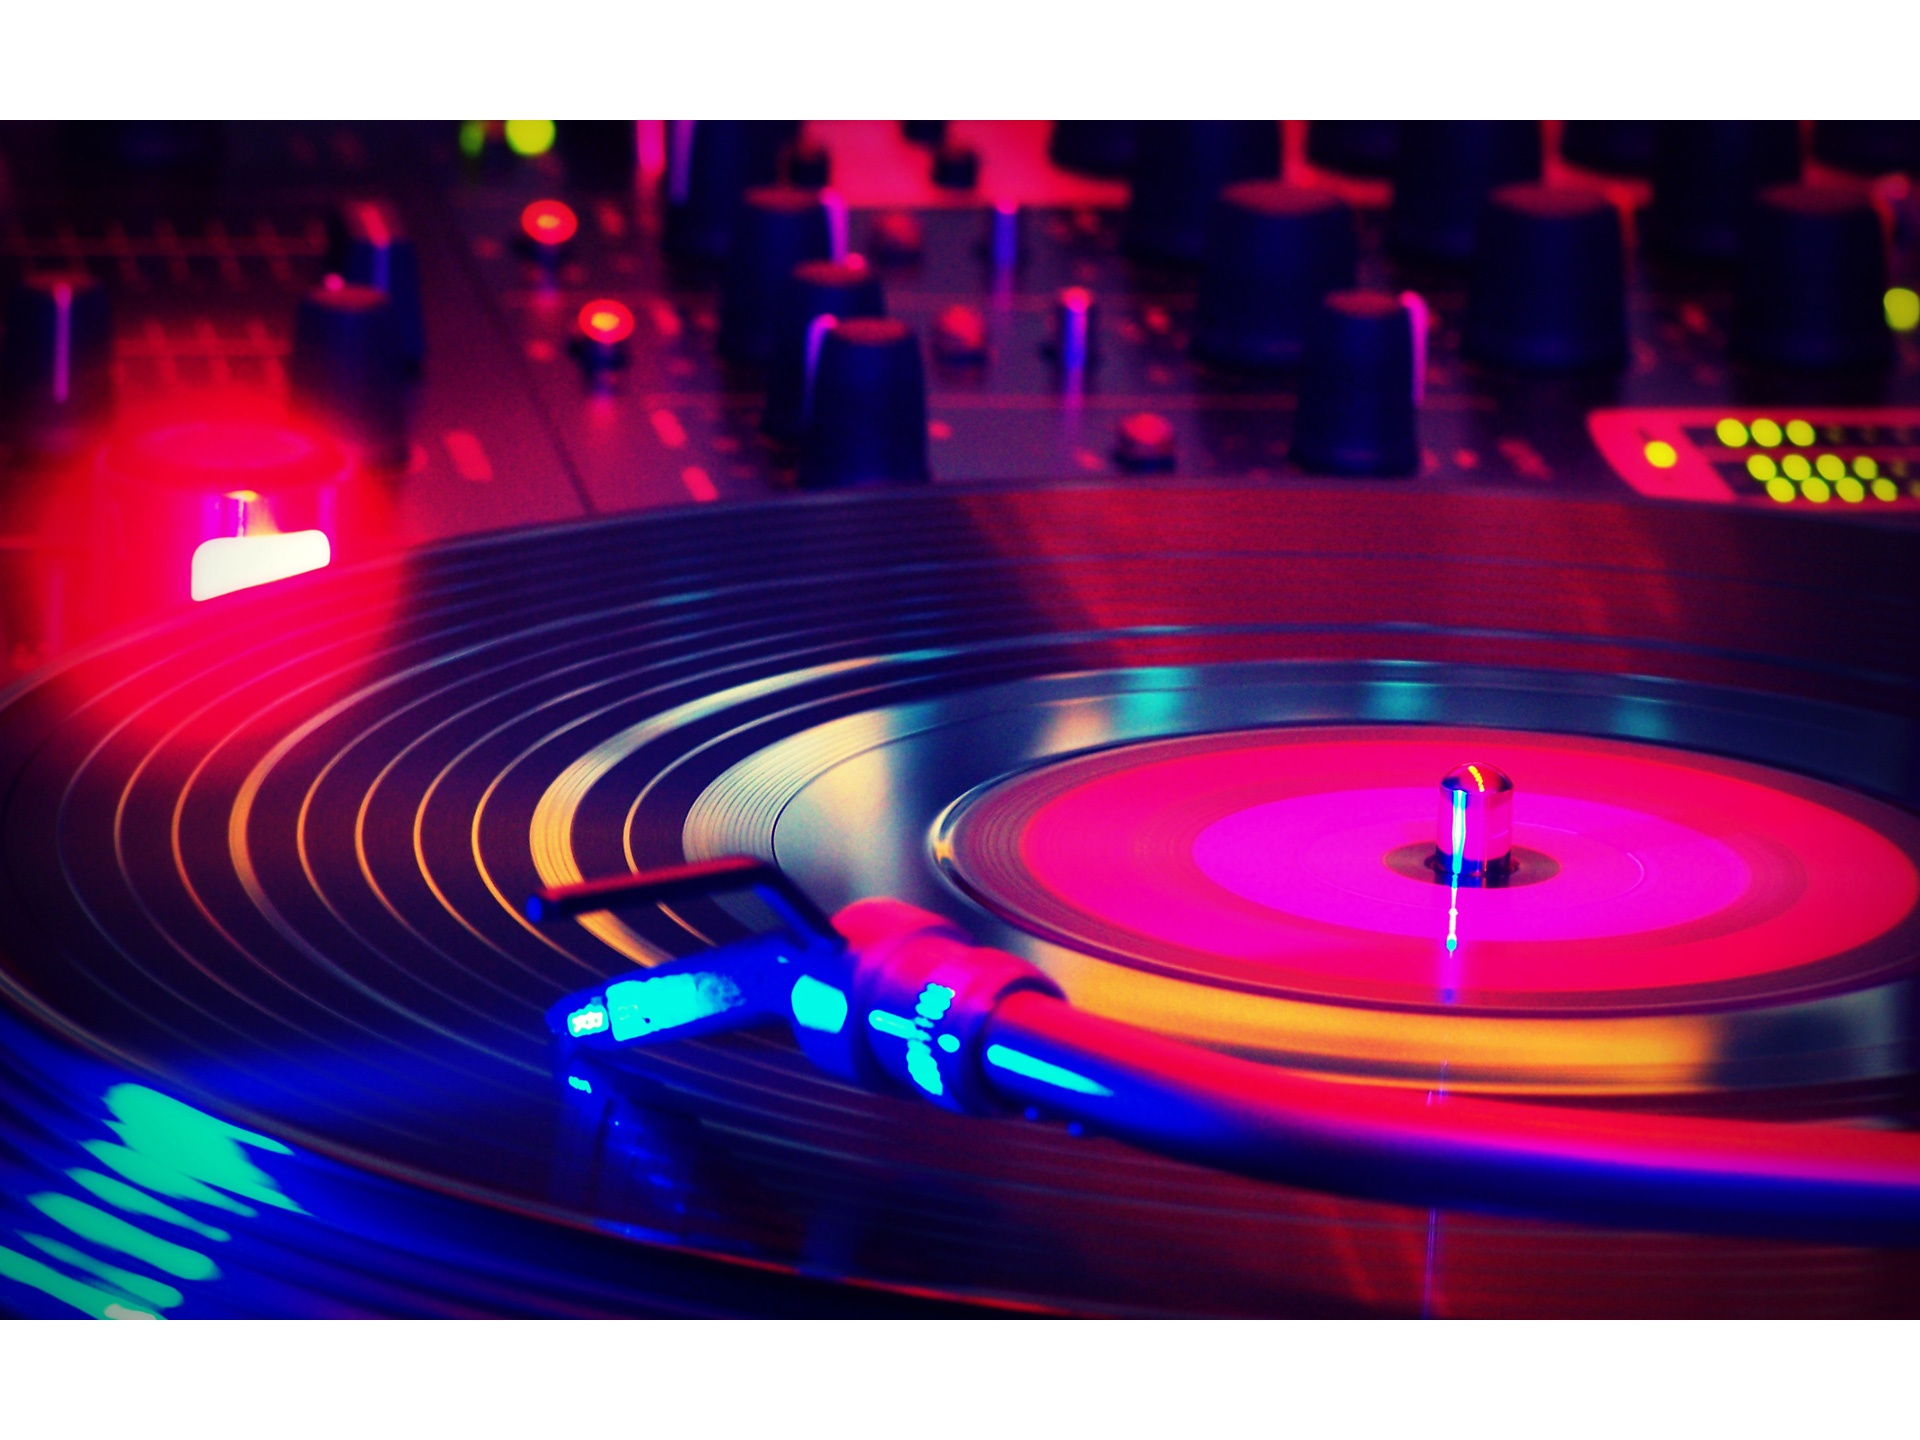 3d disco wallpaper - photo #31